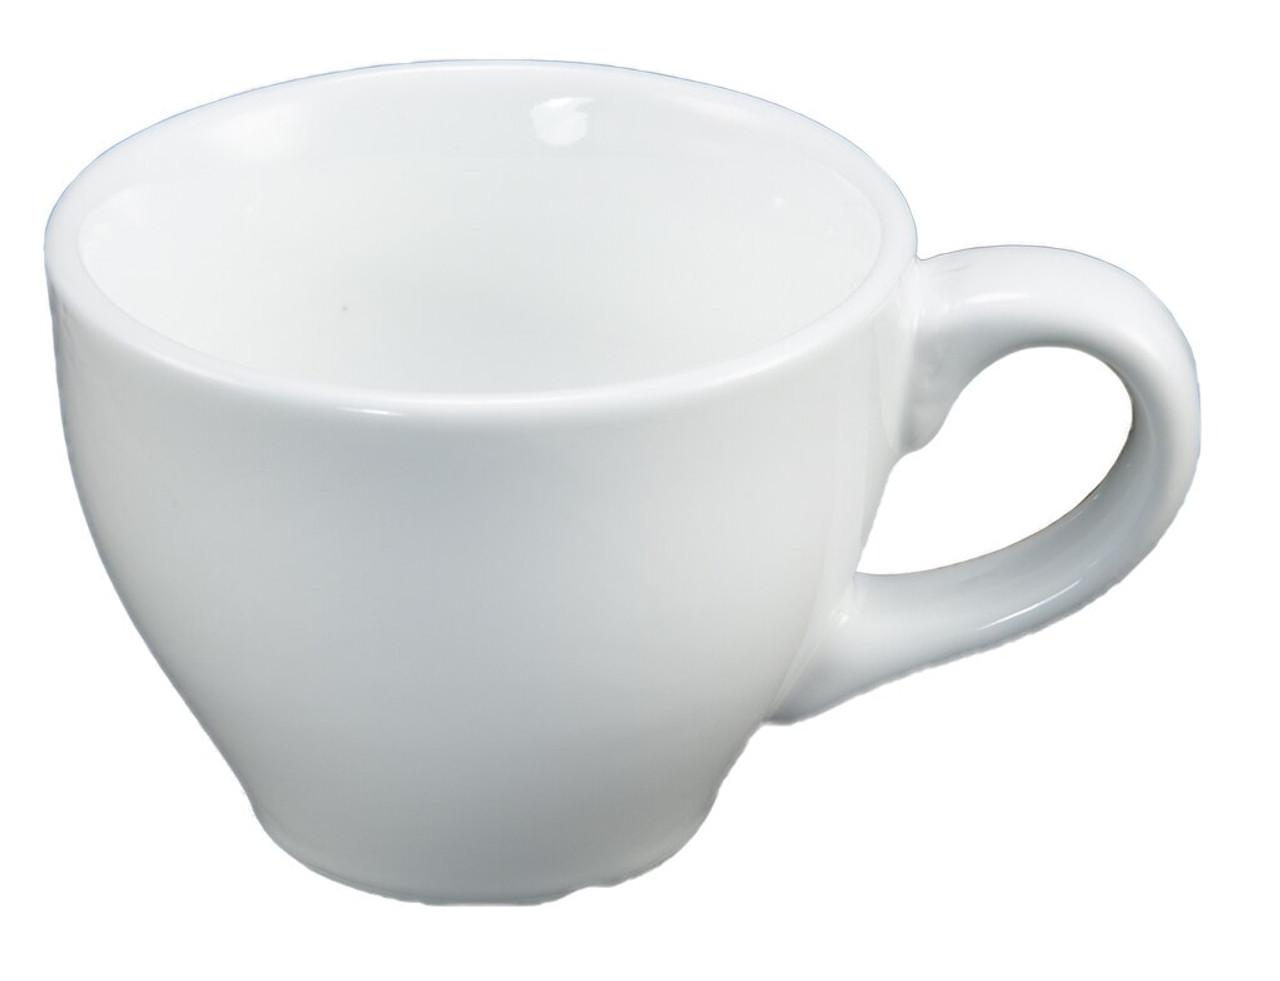 Revolution Mod Cup, 2.5 oz, White